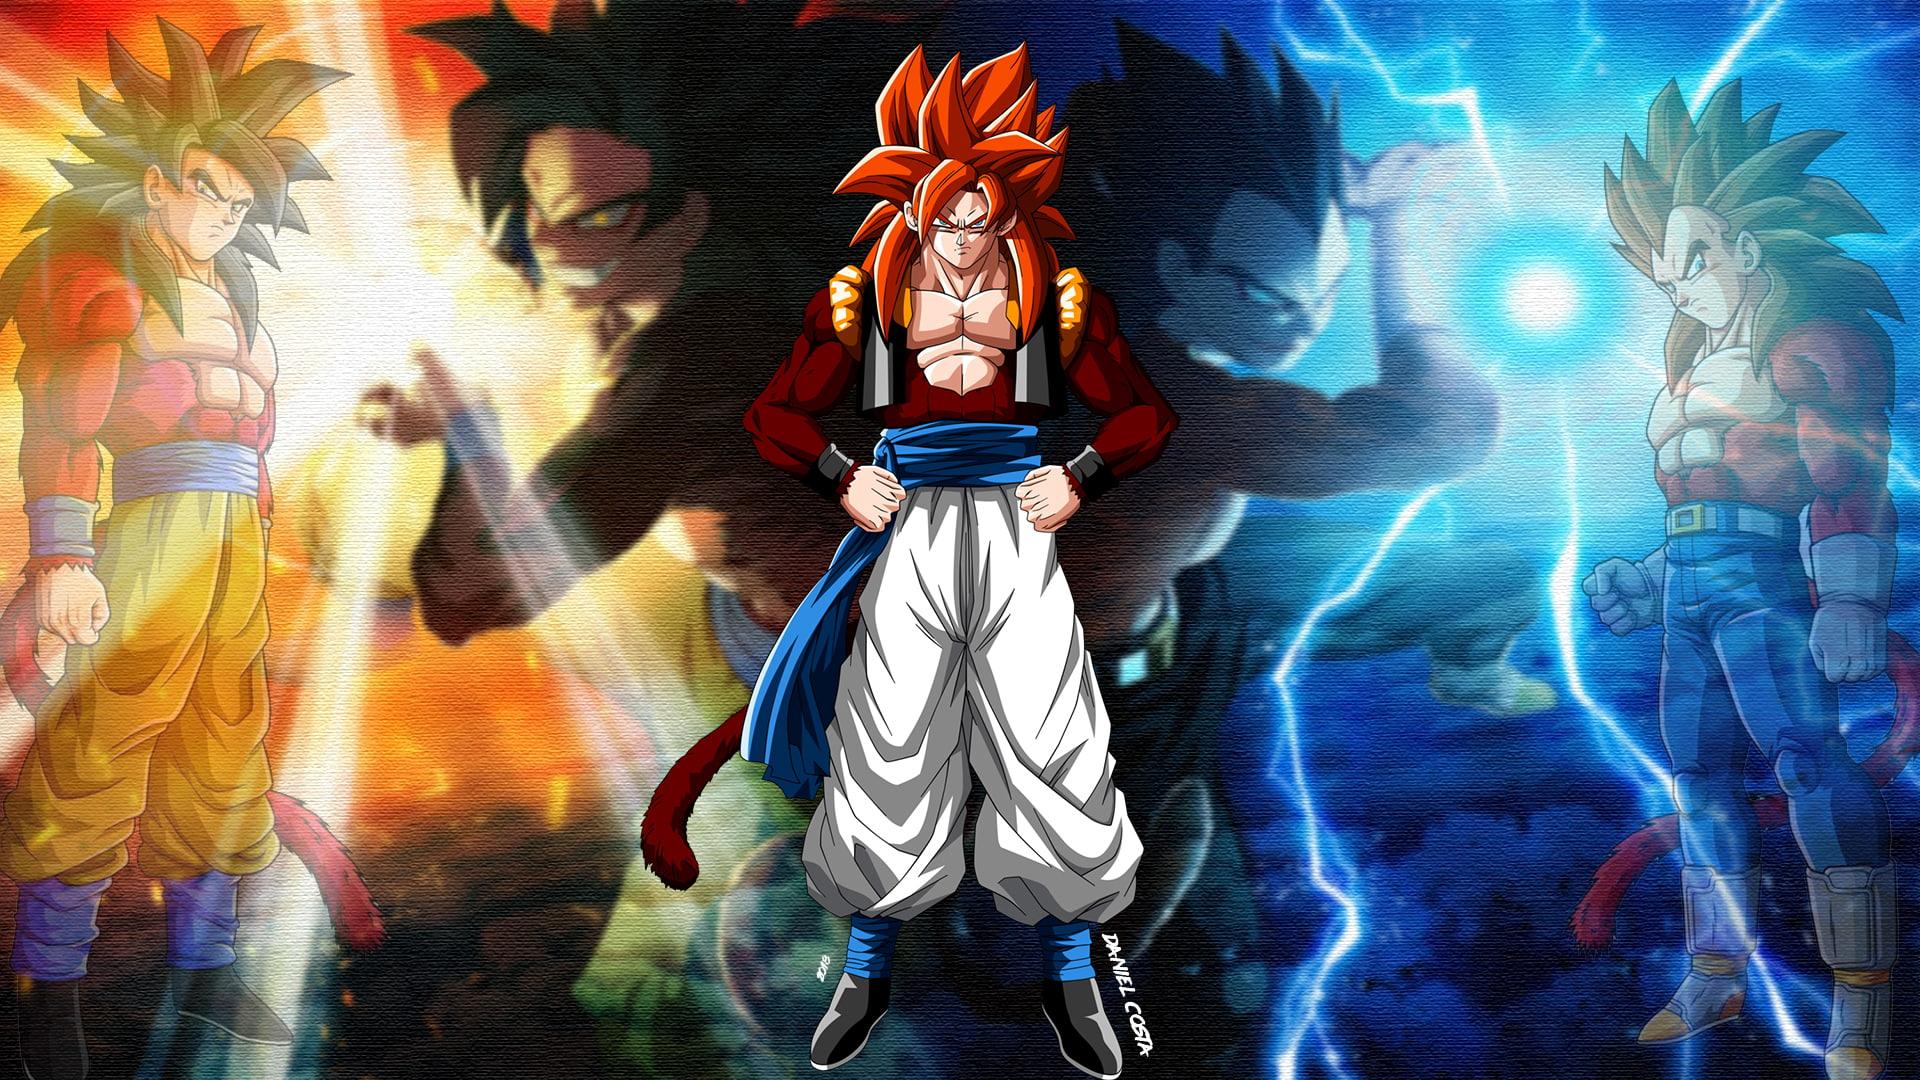 Dragon Ball Dragon Ball Gt Gogeta Son Goku Vegeta Epic Dragon Ball Background 315846 Hd Wallpaper Backgrounds Download